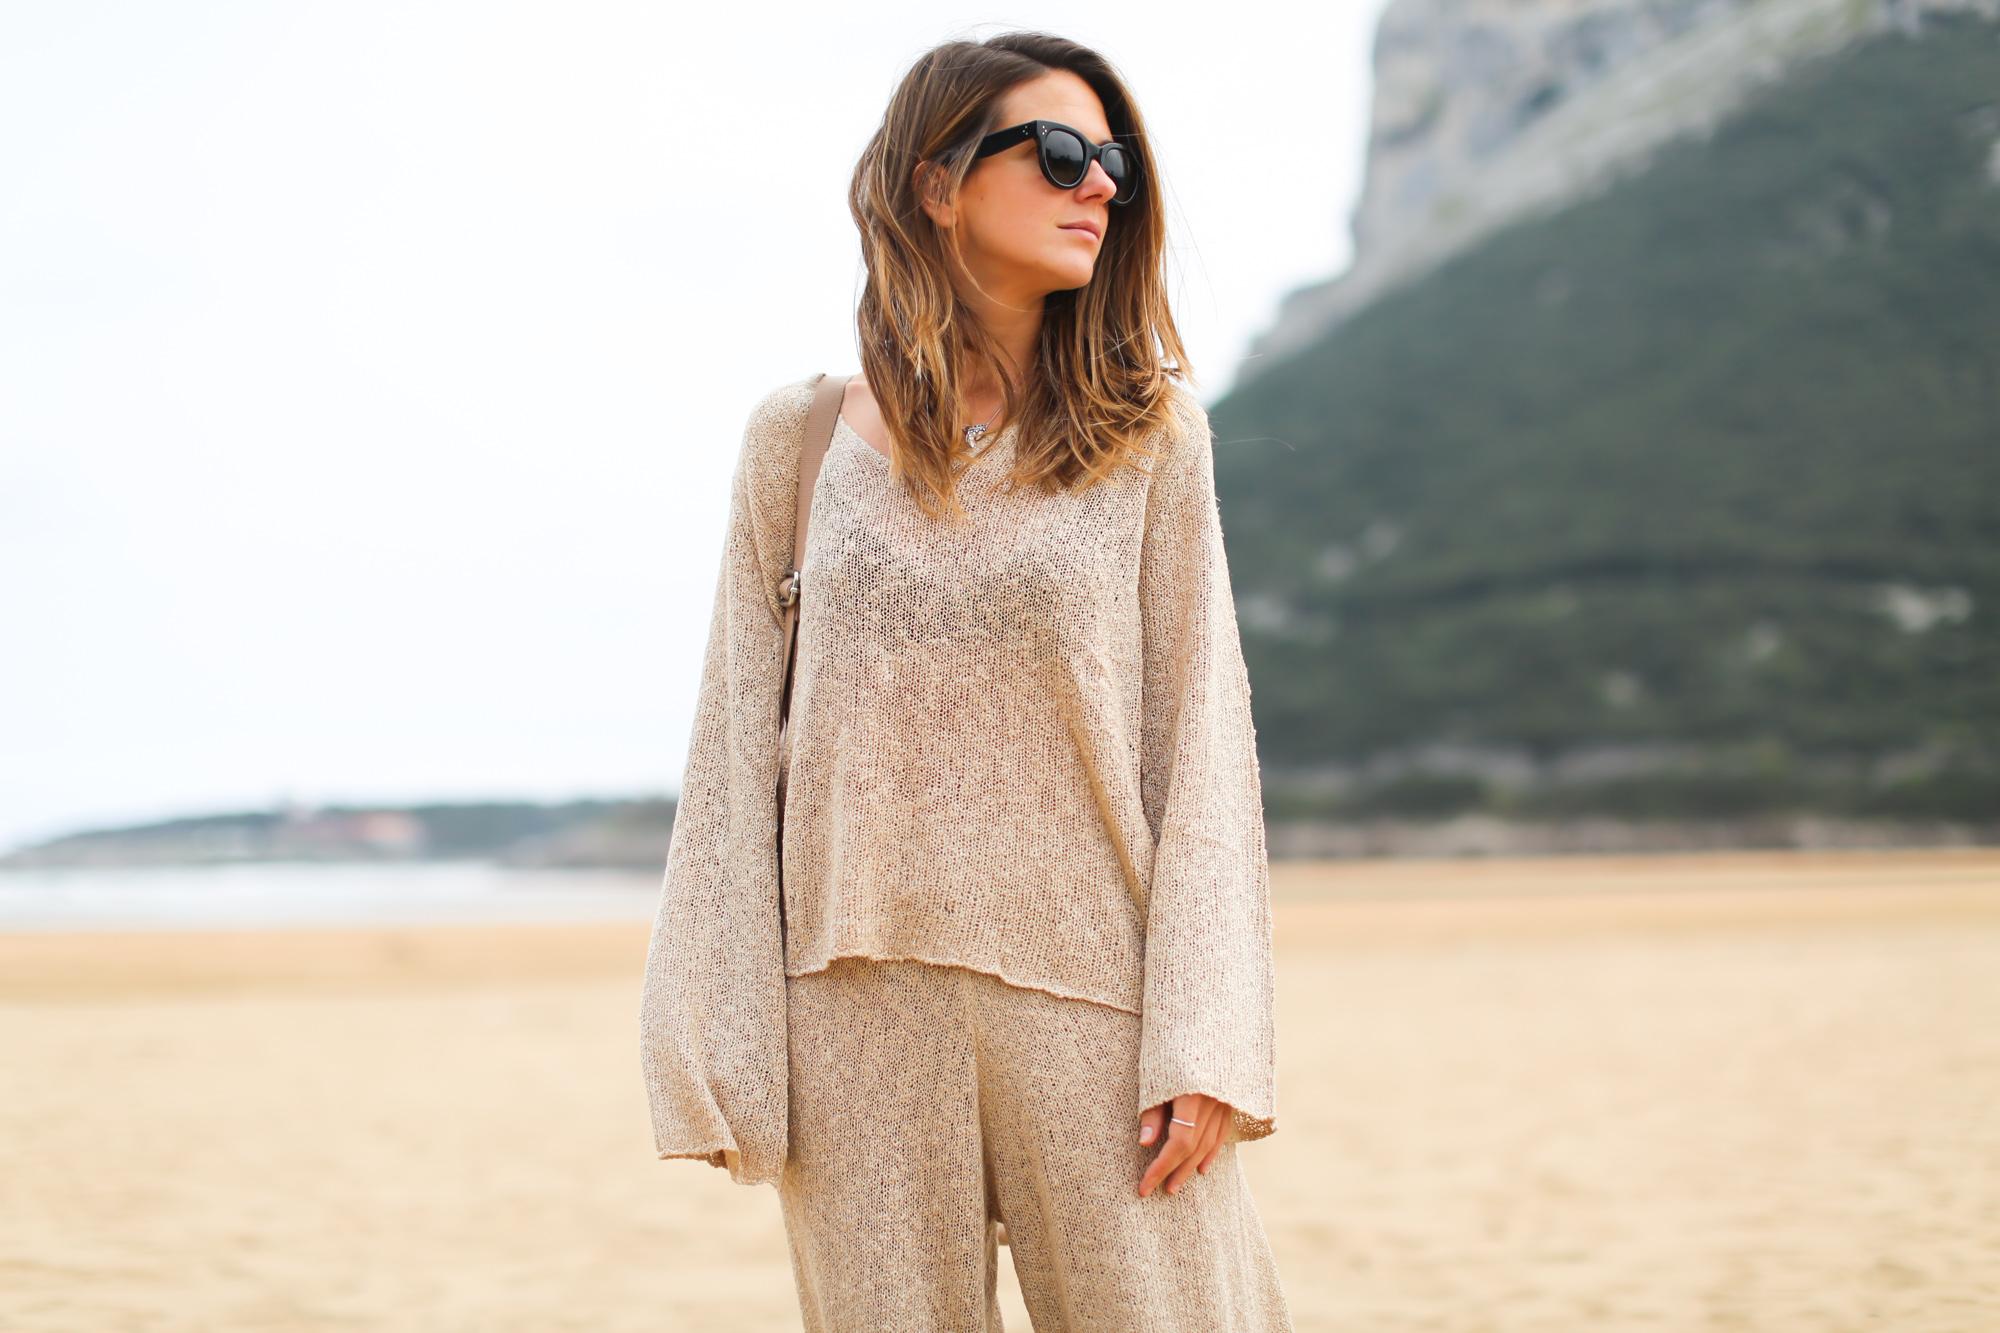 Clochet_conjunto_punto_beige_Zara-4